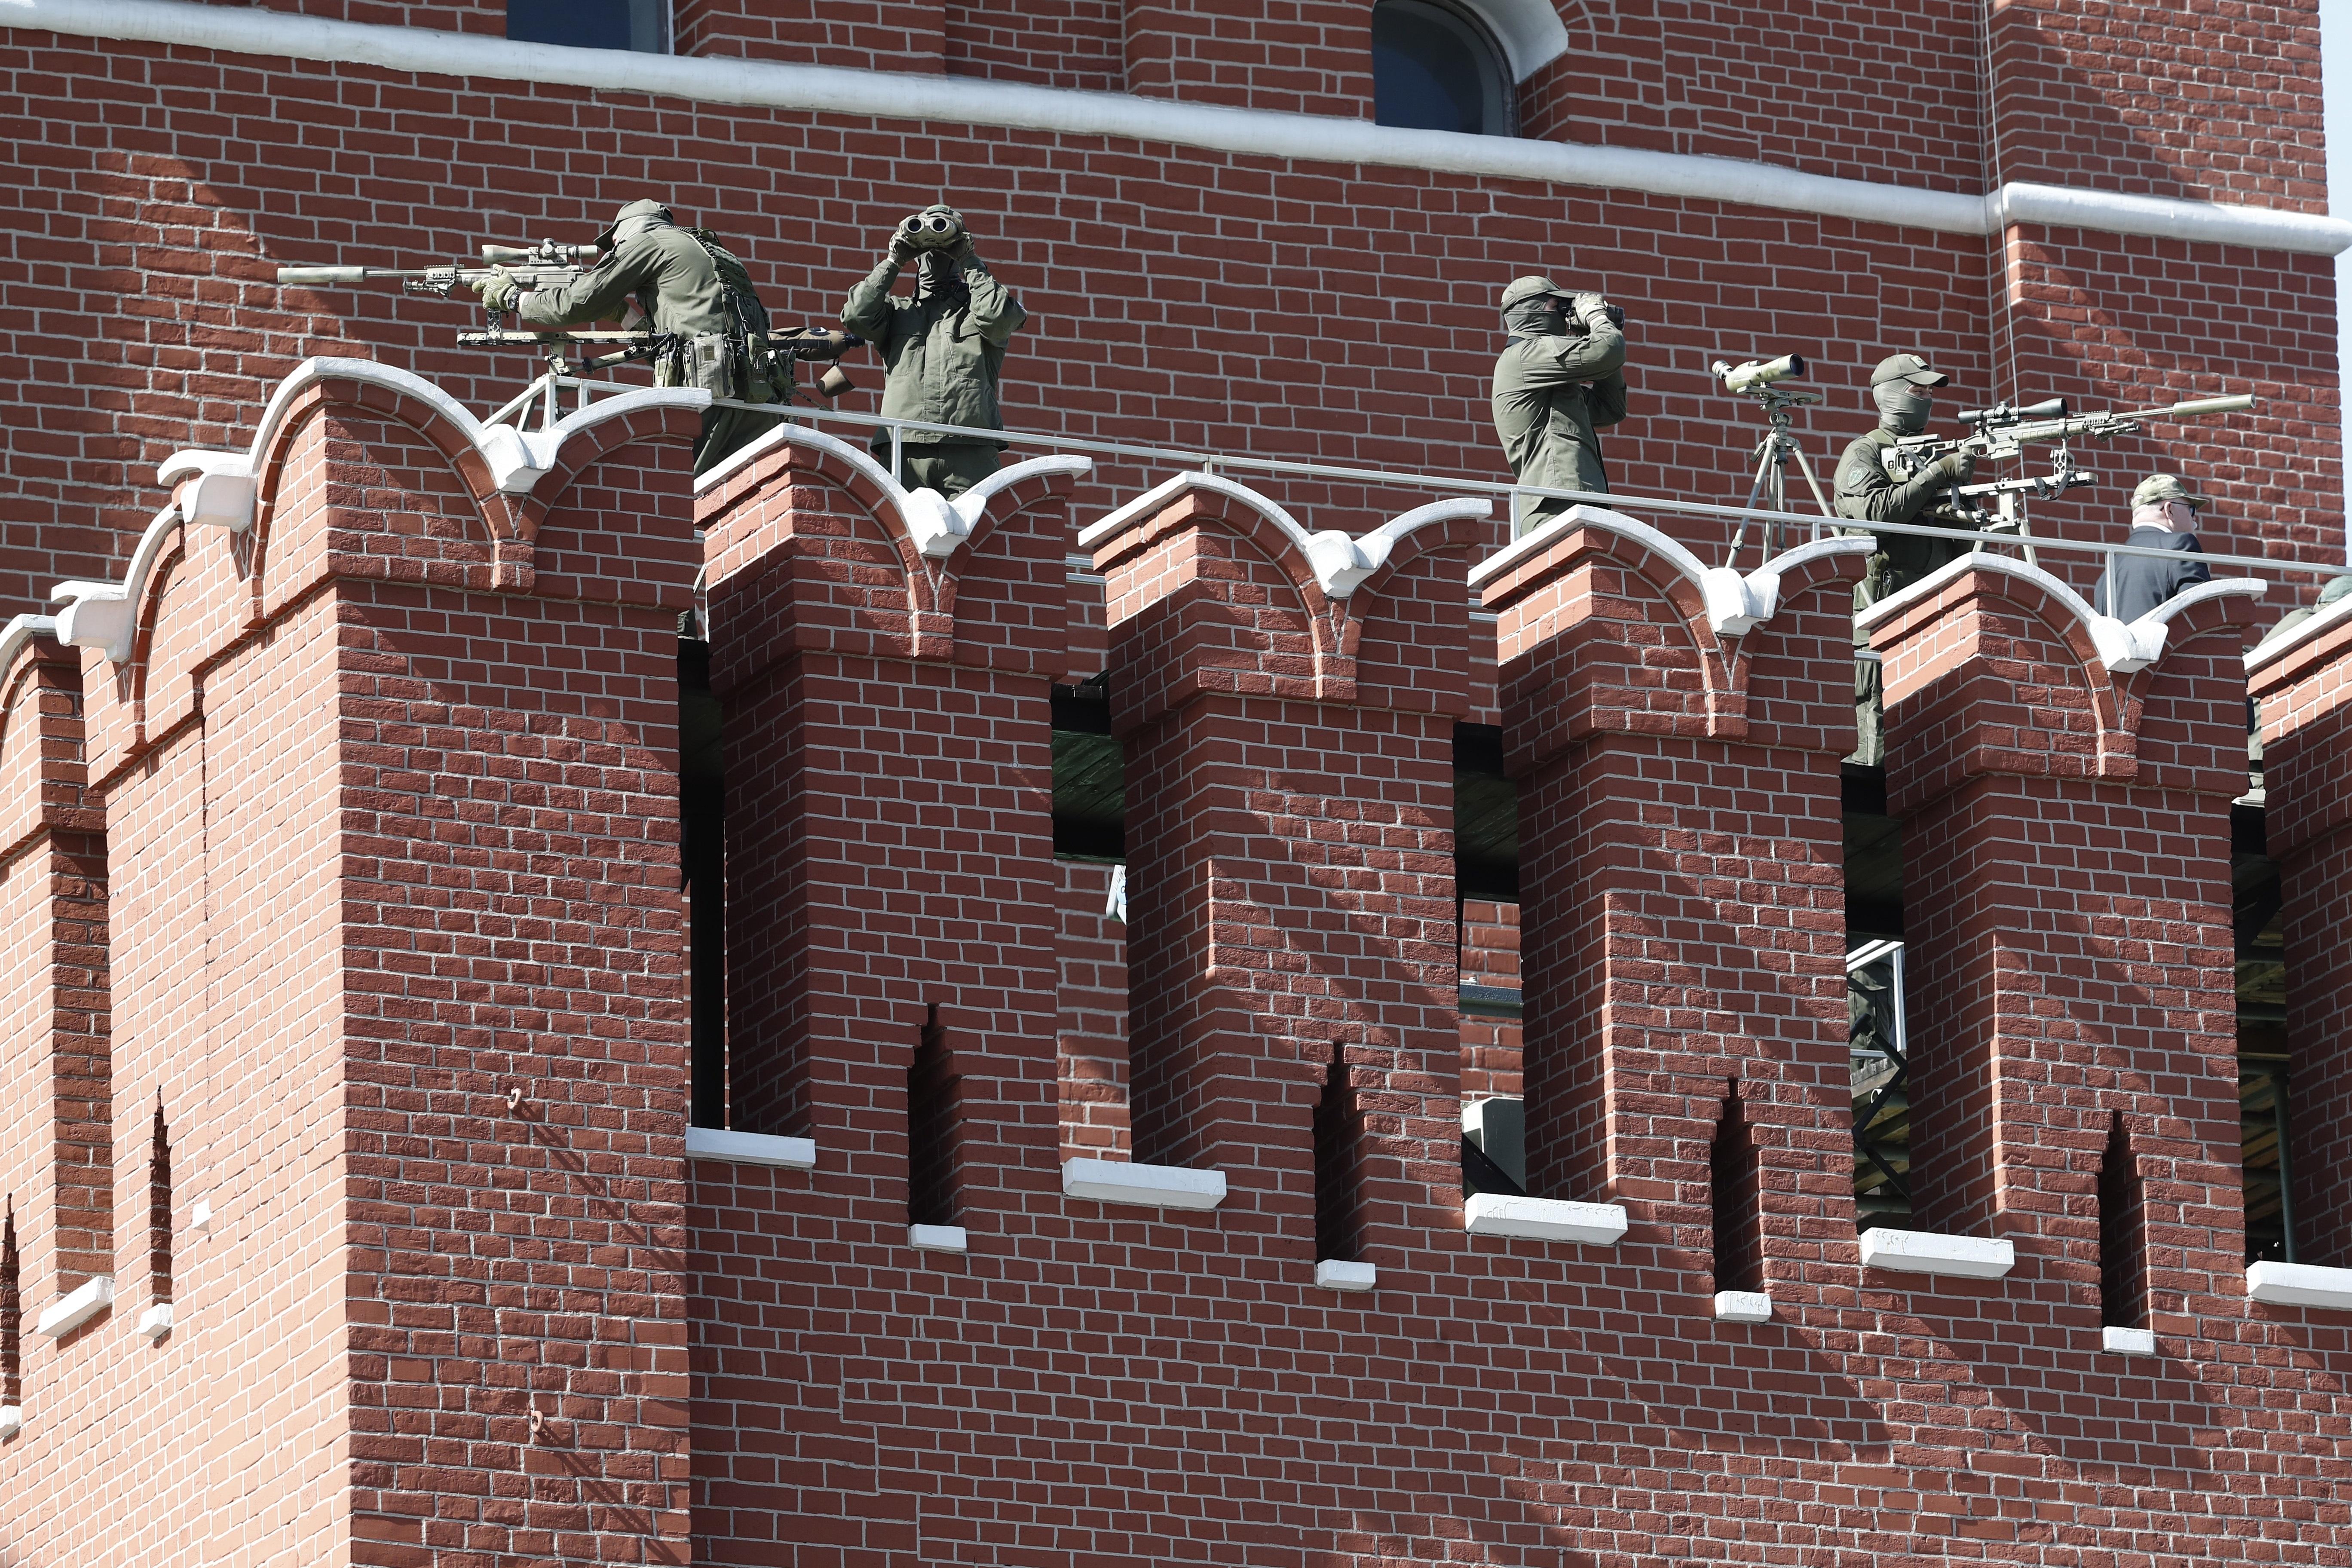 Снайперисти се грижат за сигурността по време на парада.